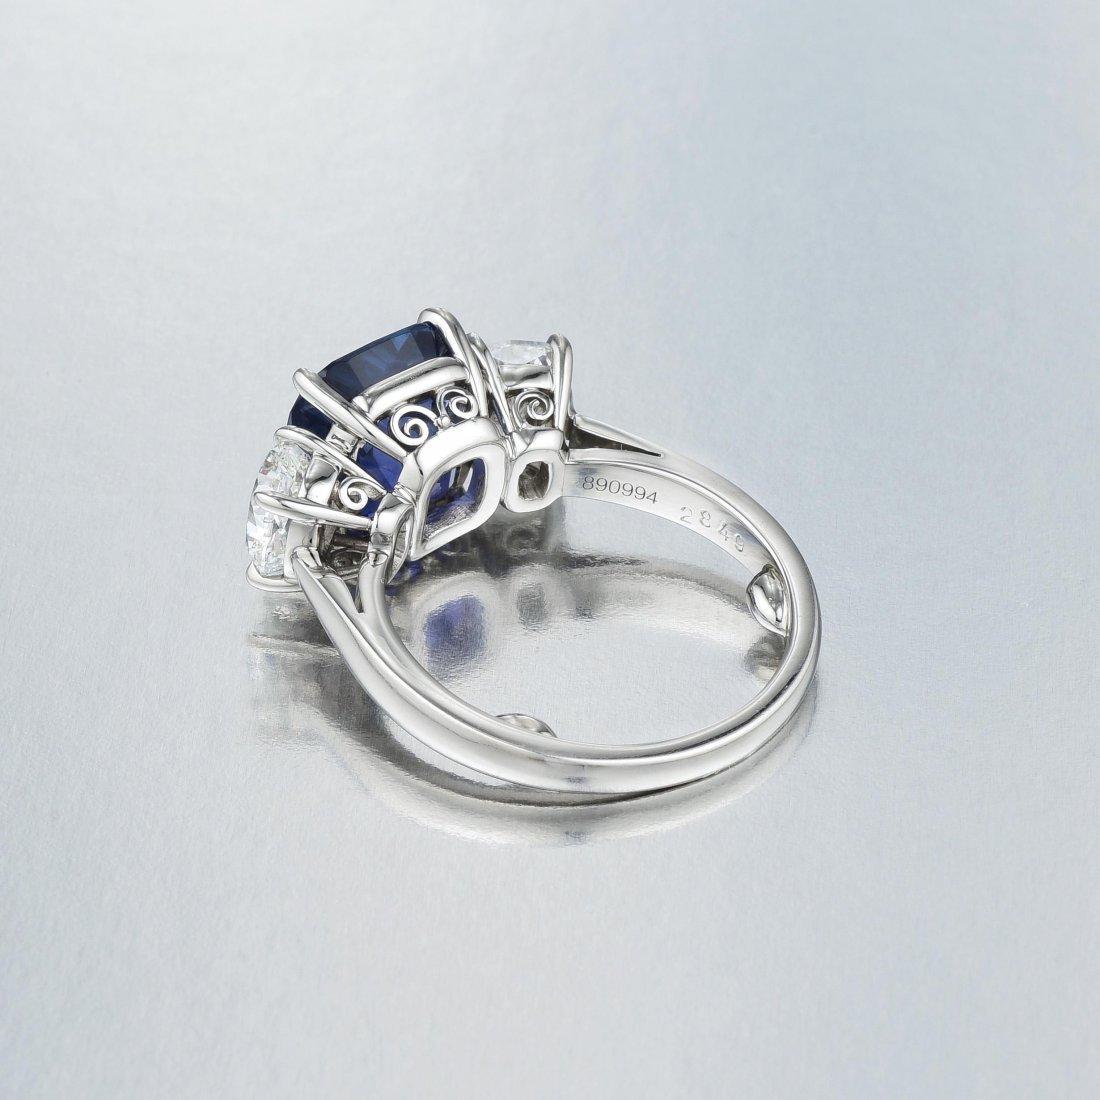 Cartier 6.69-Carat Burmese Sapphire and Diamond Ring - 5